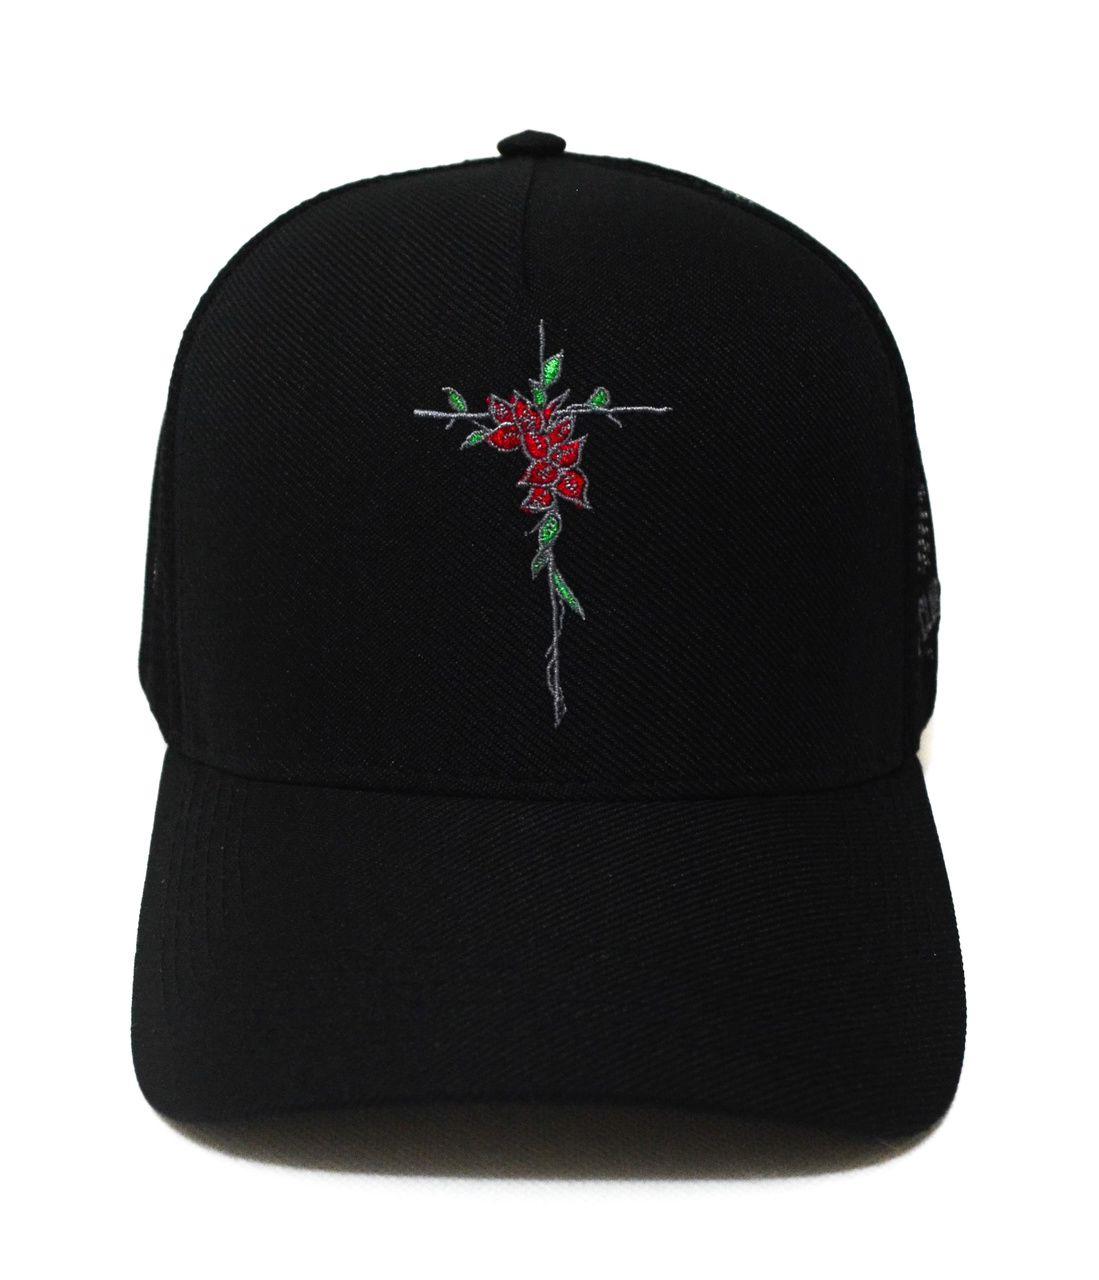 Boné Fé Cruz de Rosas Preto Aba Curva Snapback